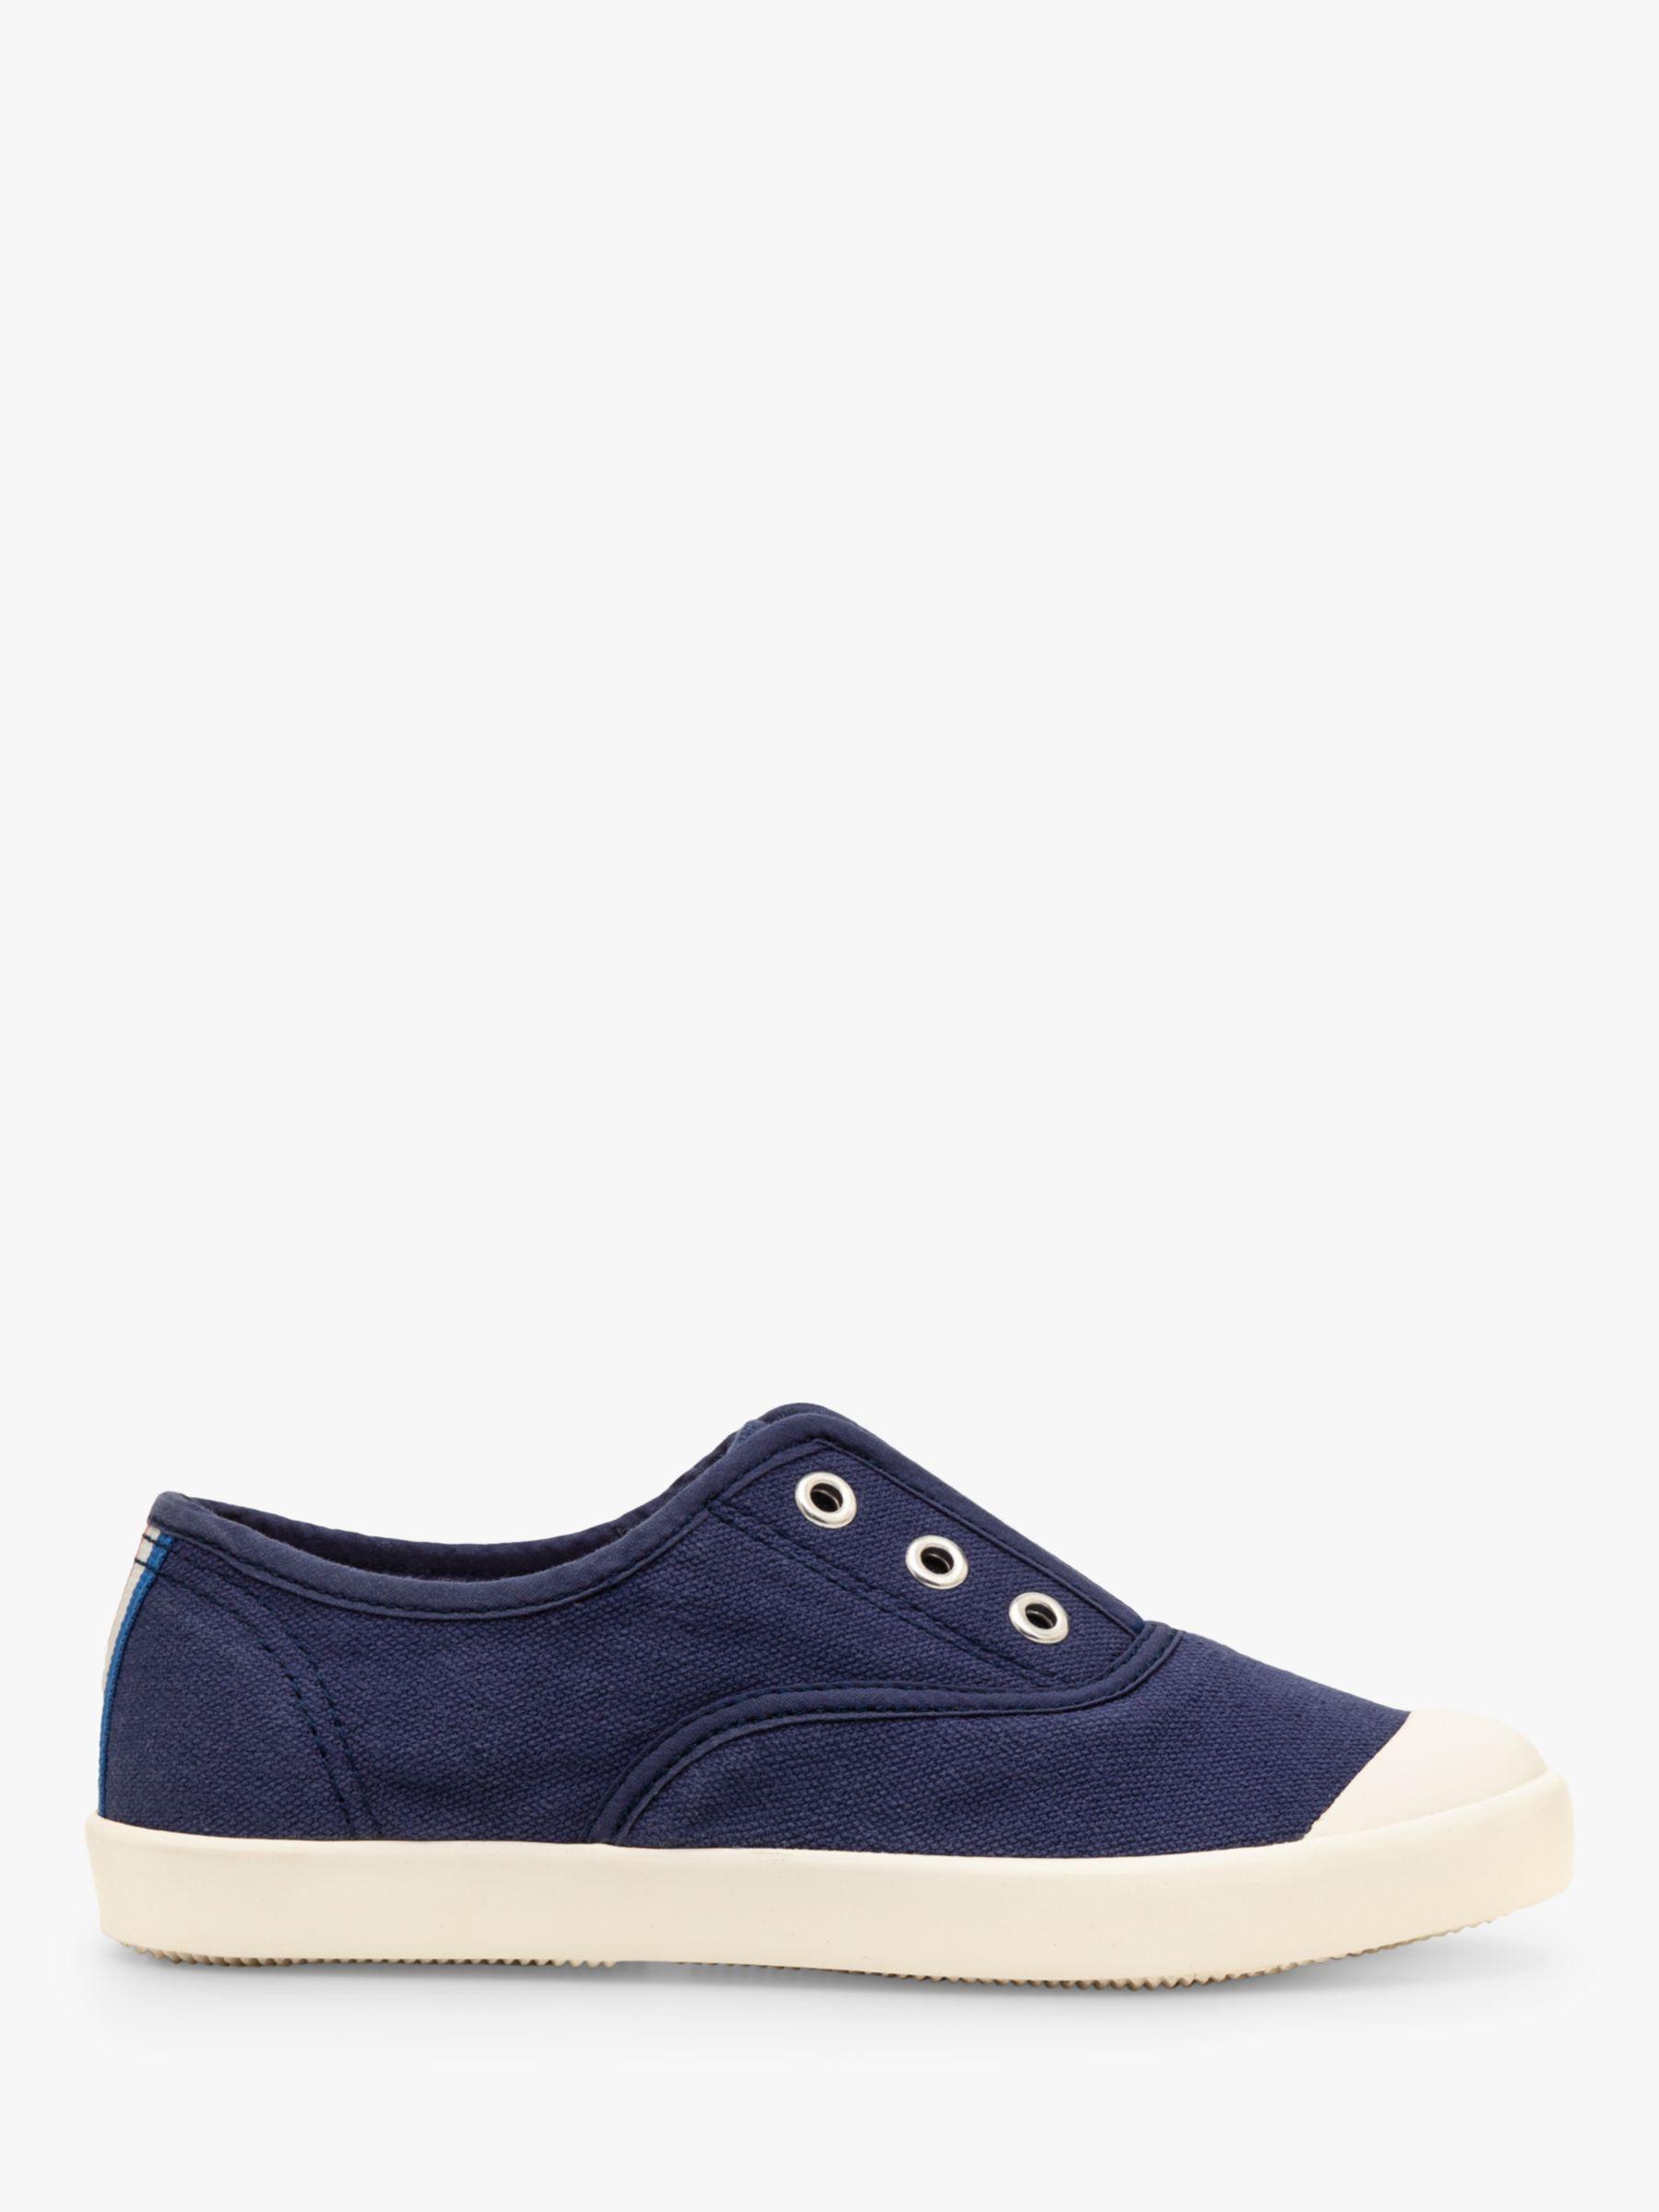 Mini Boden Mini Boden Children's Laceless Canvas Shoes, College Navy